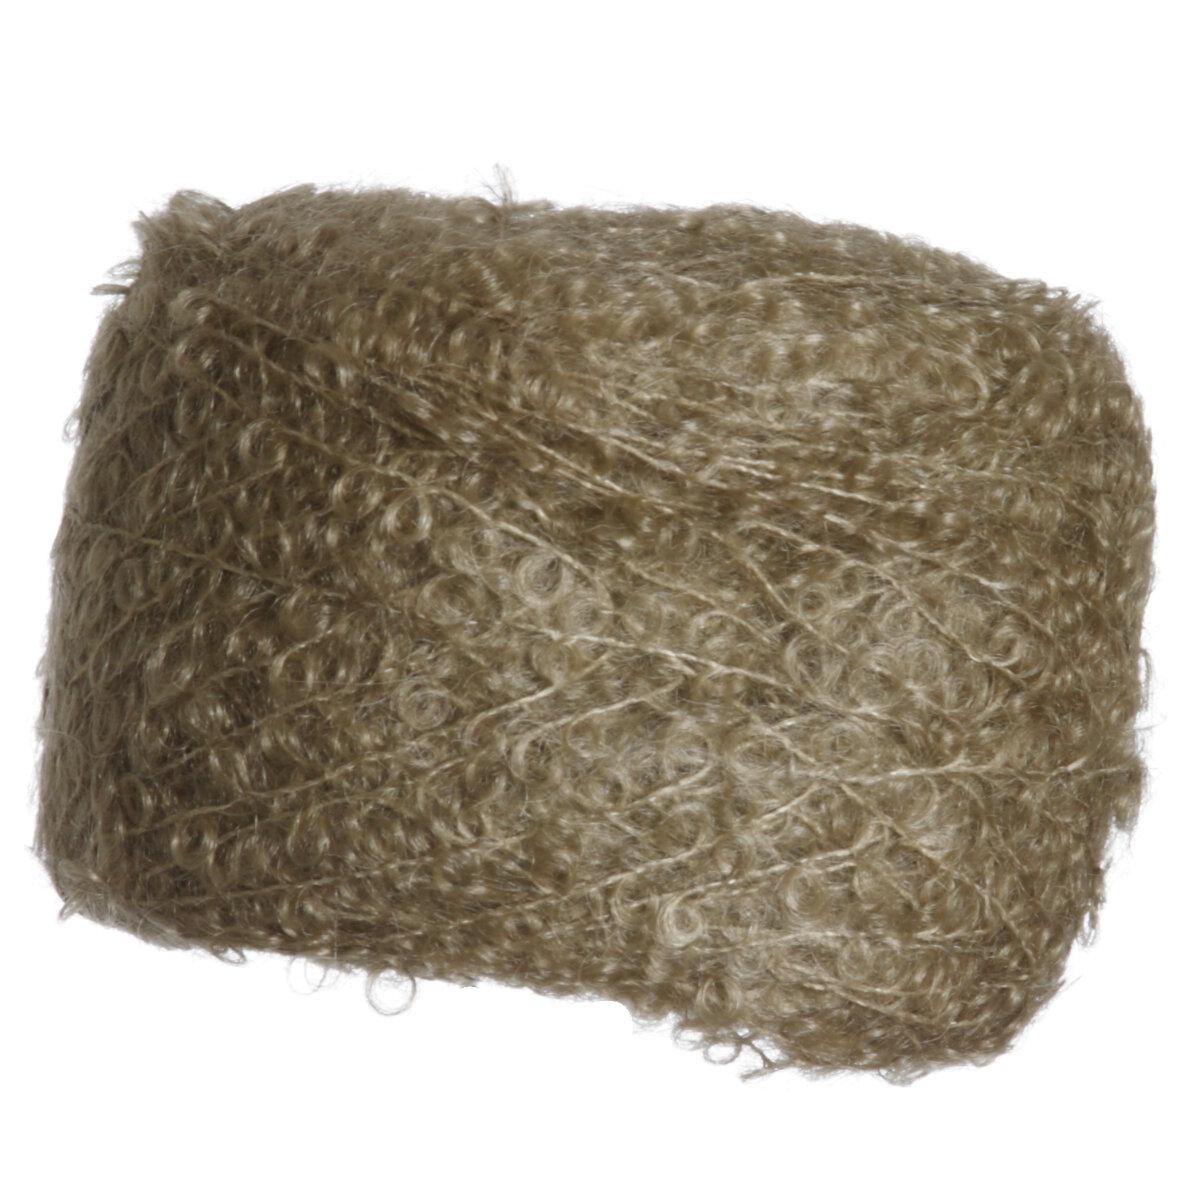 Be Sweet Medium Boucle Yarn - Dark Camel at Jimmy Beans Wool